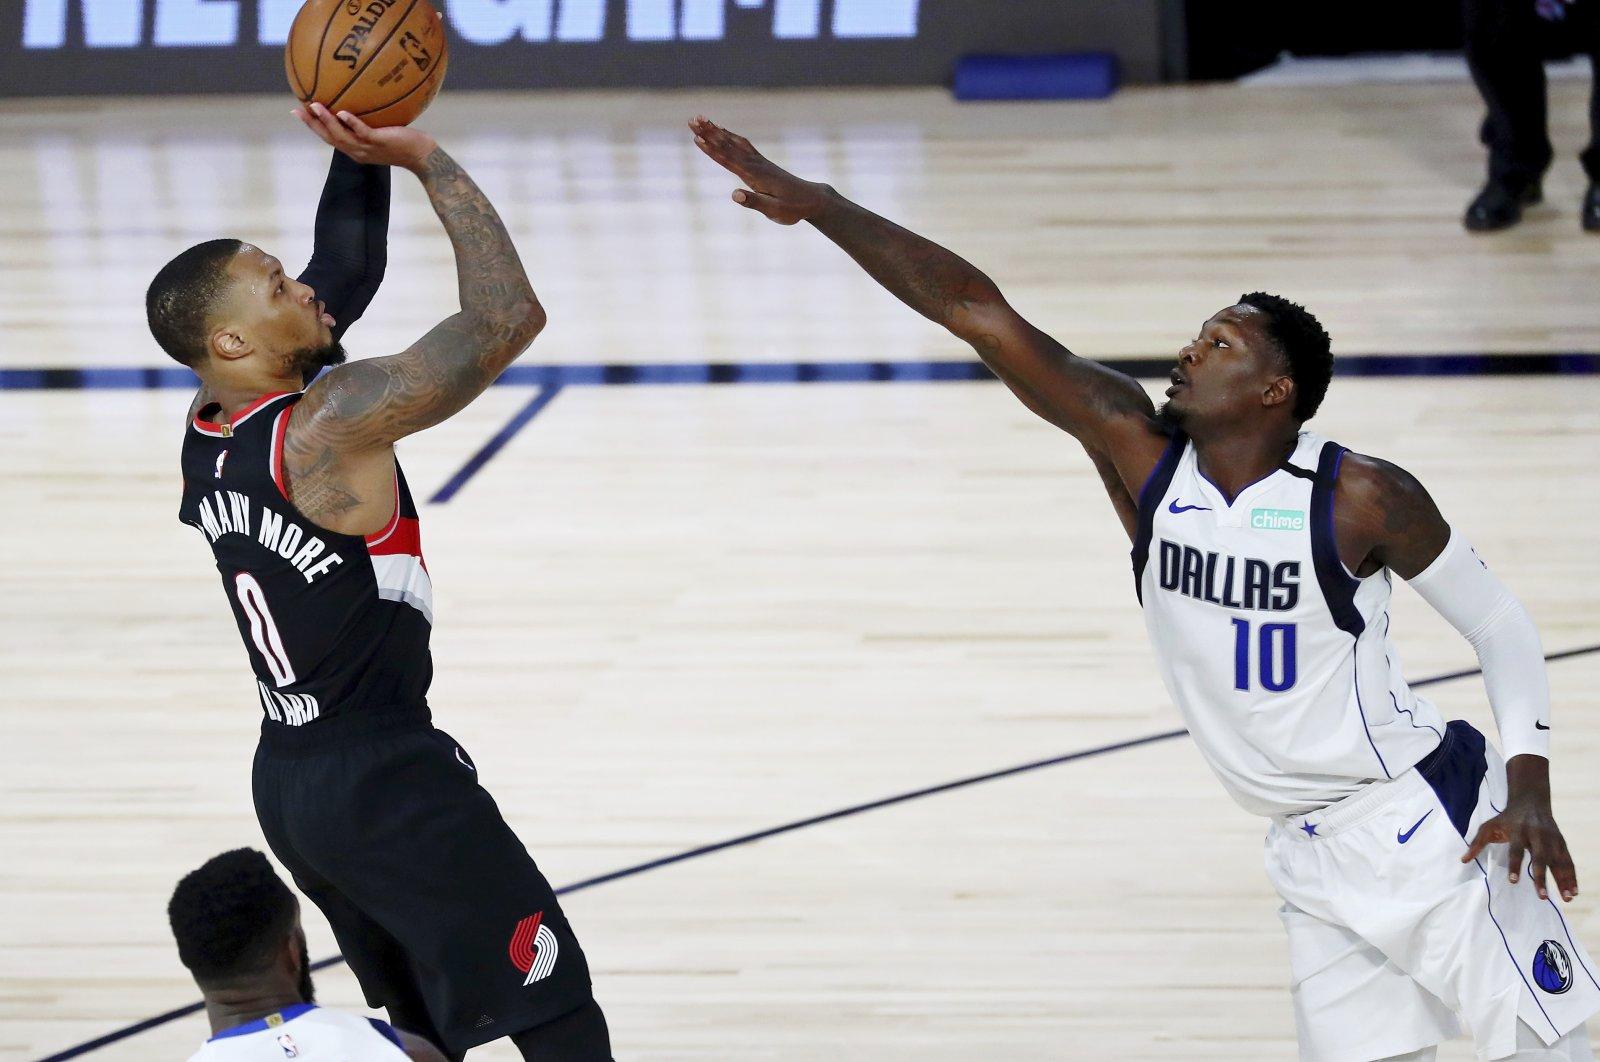 Portland Trail Blazers guard Damian Lillard shoots as Dallas Mavericks forward Dorian Finney-Smith attempts to block during the second half of an NBA basketball game, Lake Buena Vista, Florida, U.S., Aug. 11, 2020. (AP Photo)